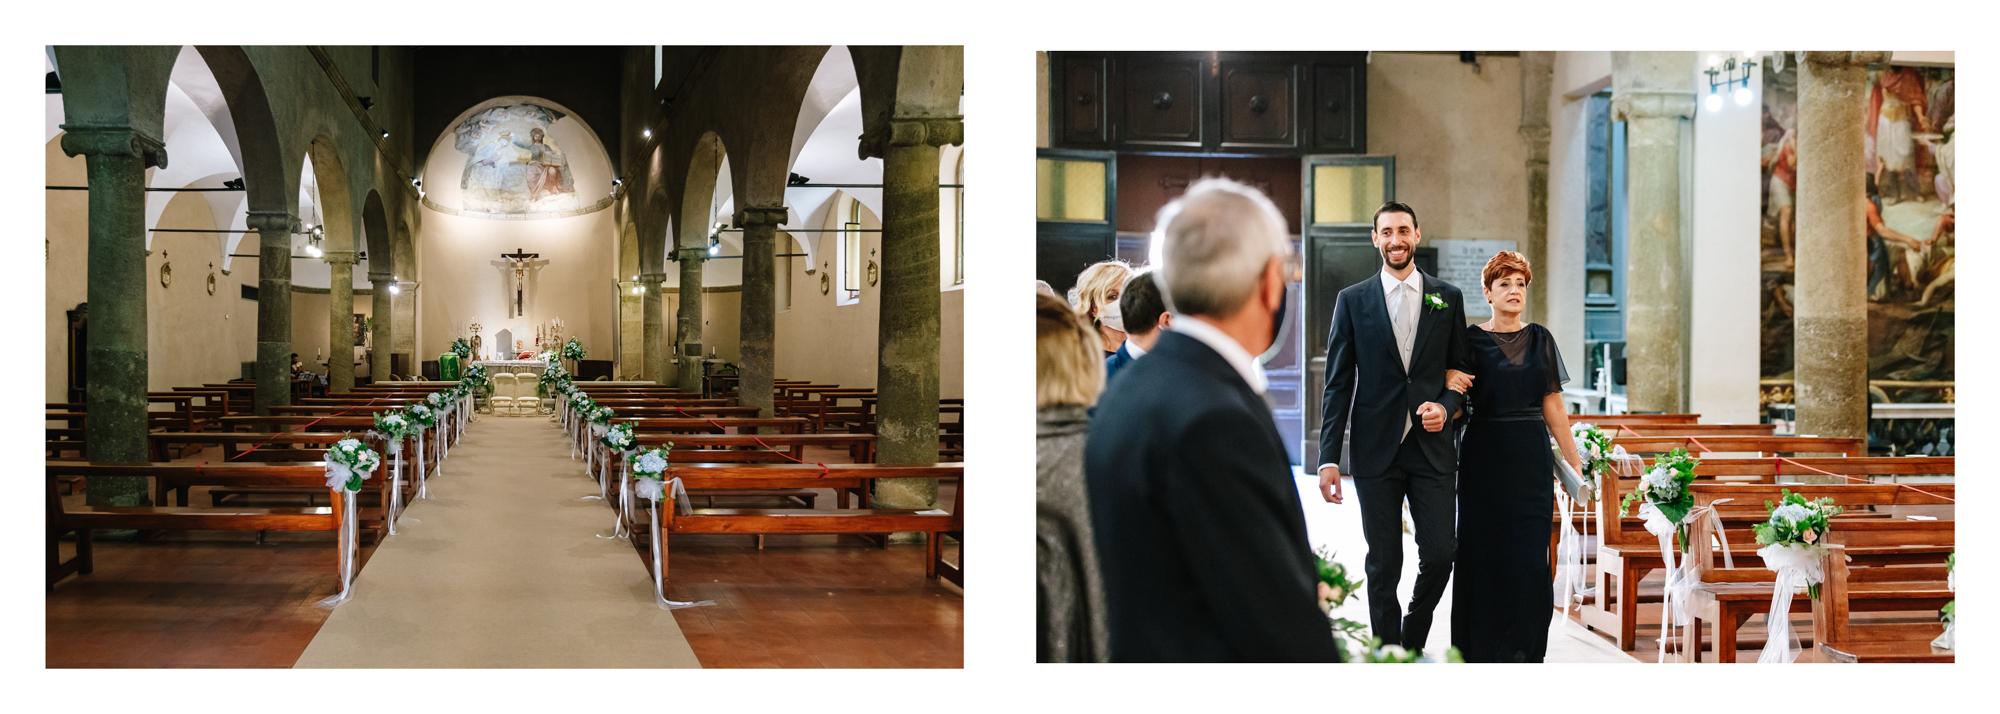 entrata sposo